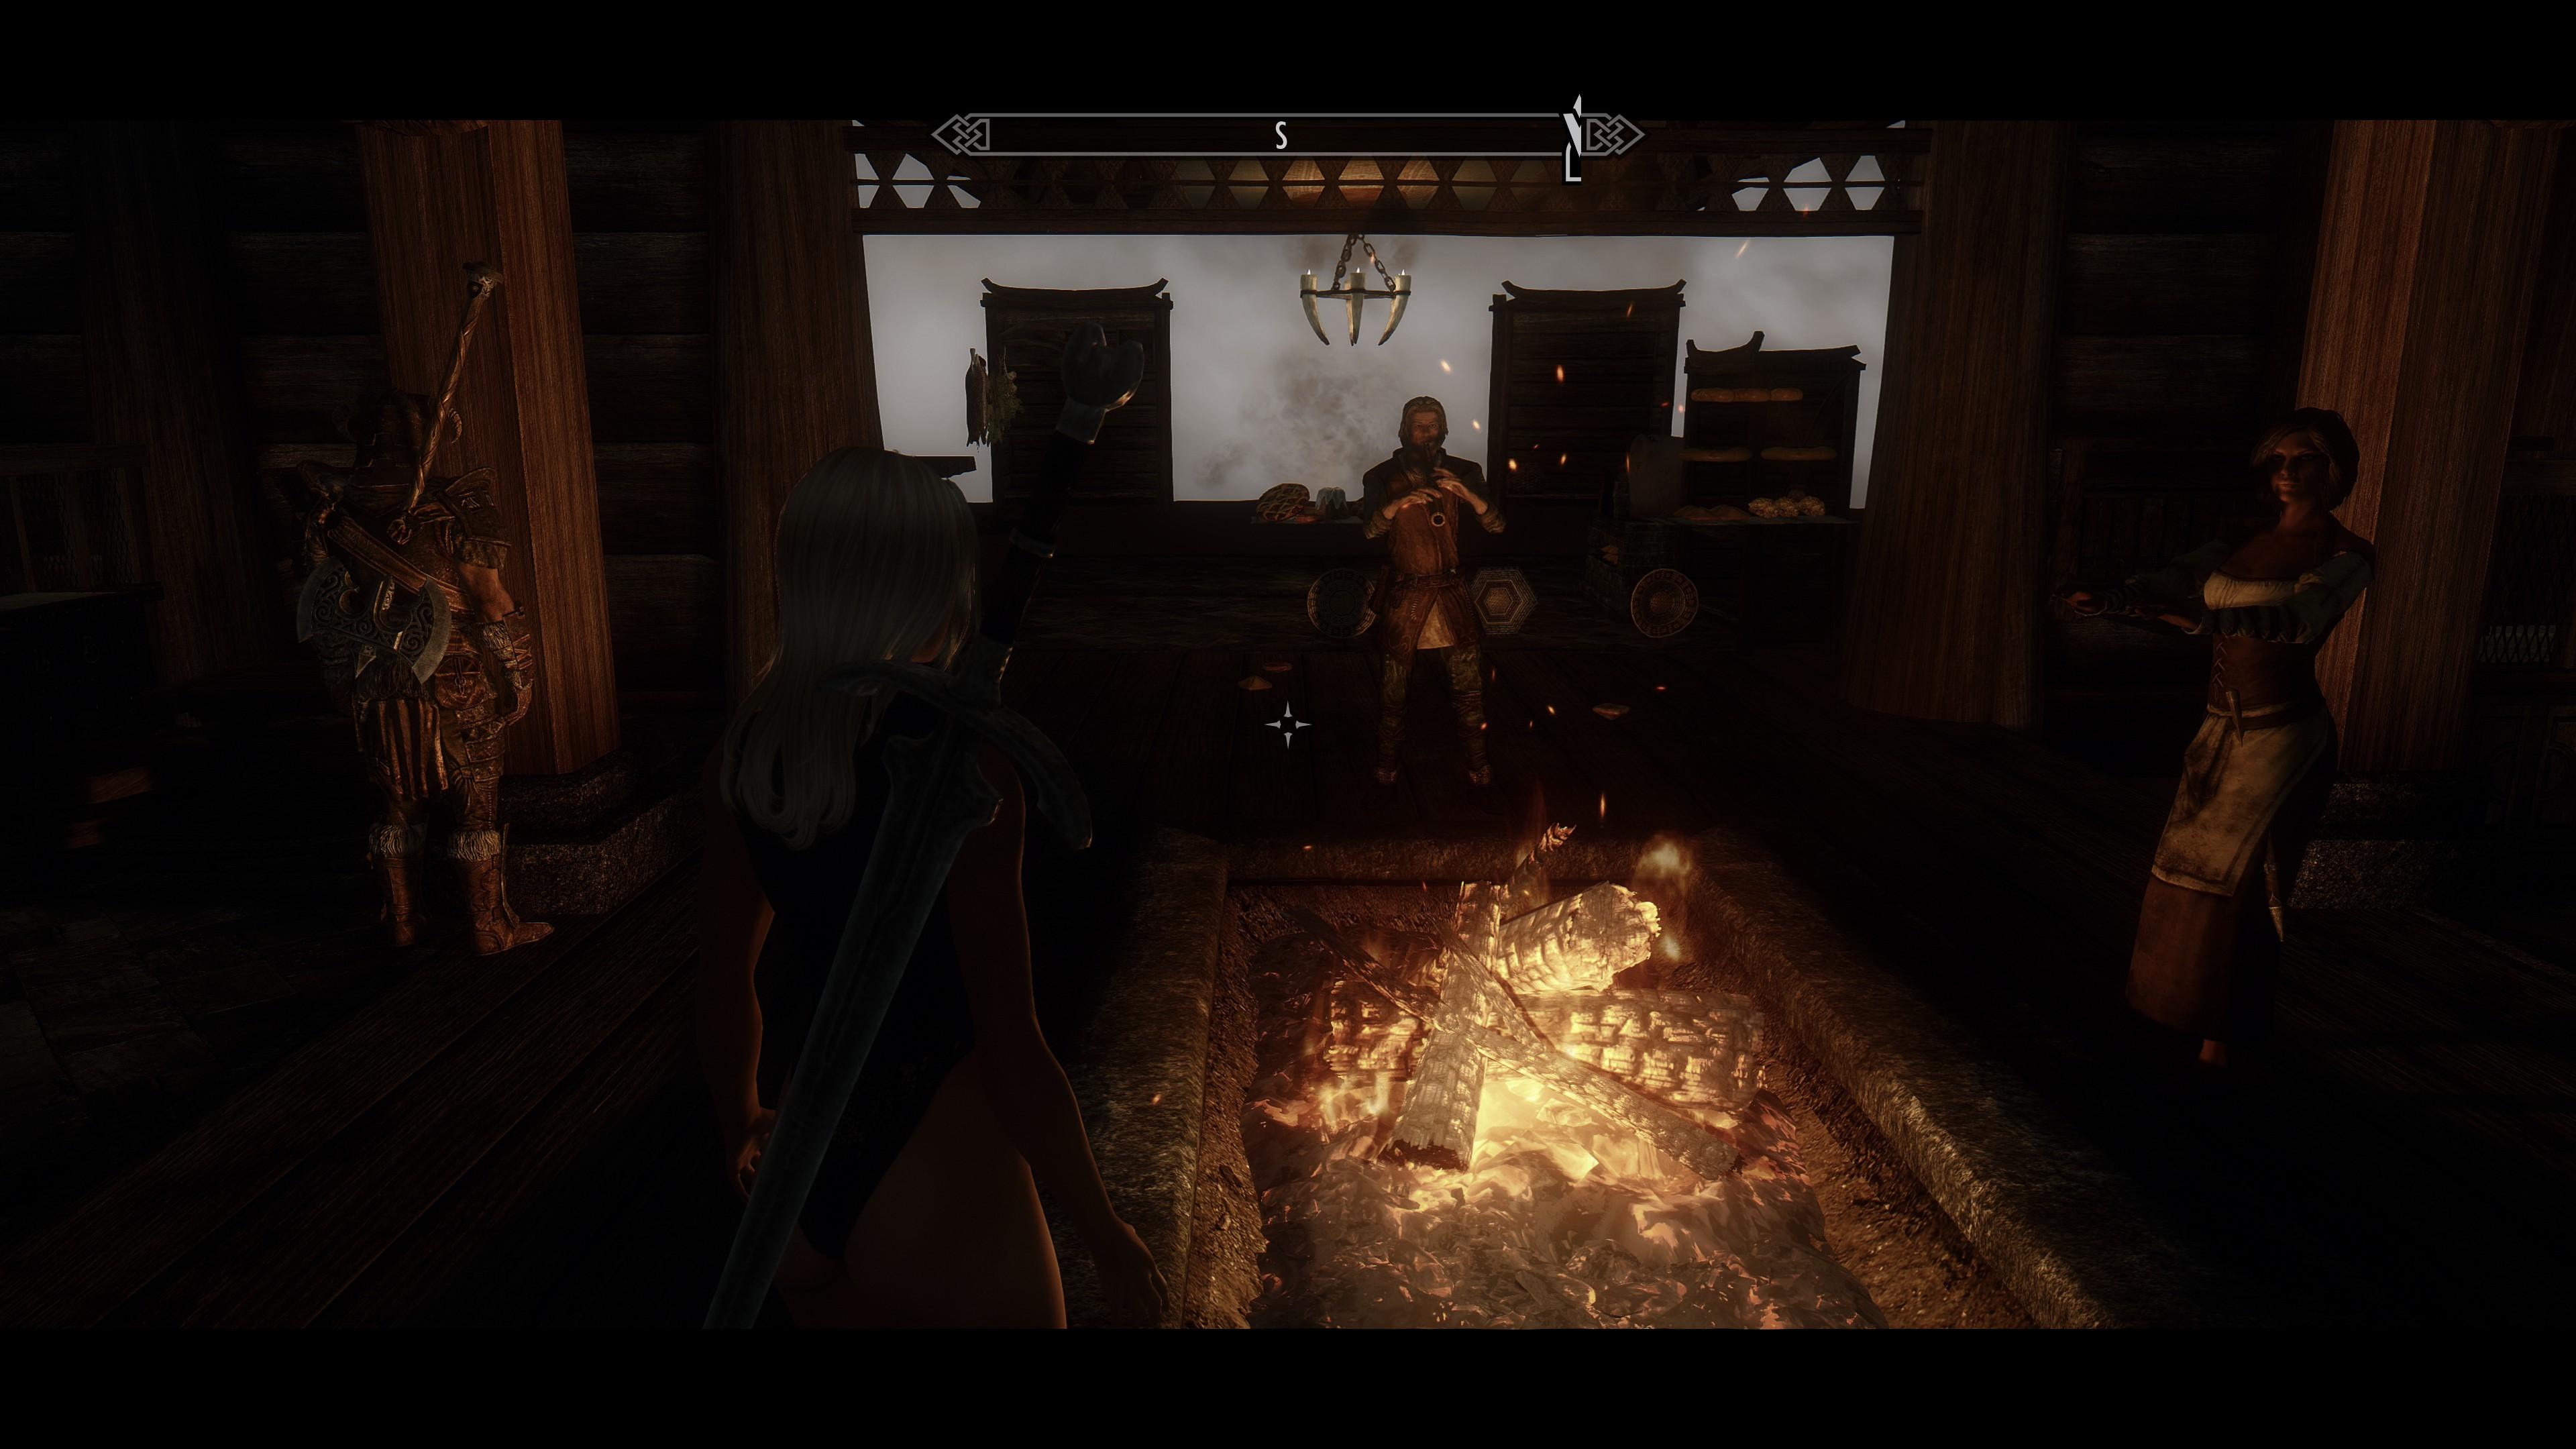 20191204201258_1.jpg - The Elder Scrolls 5: Skyrim